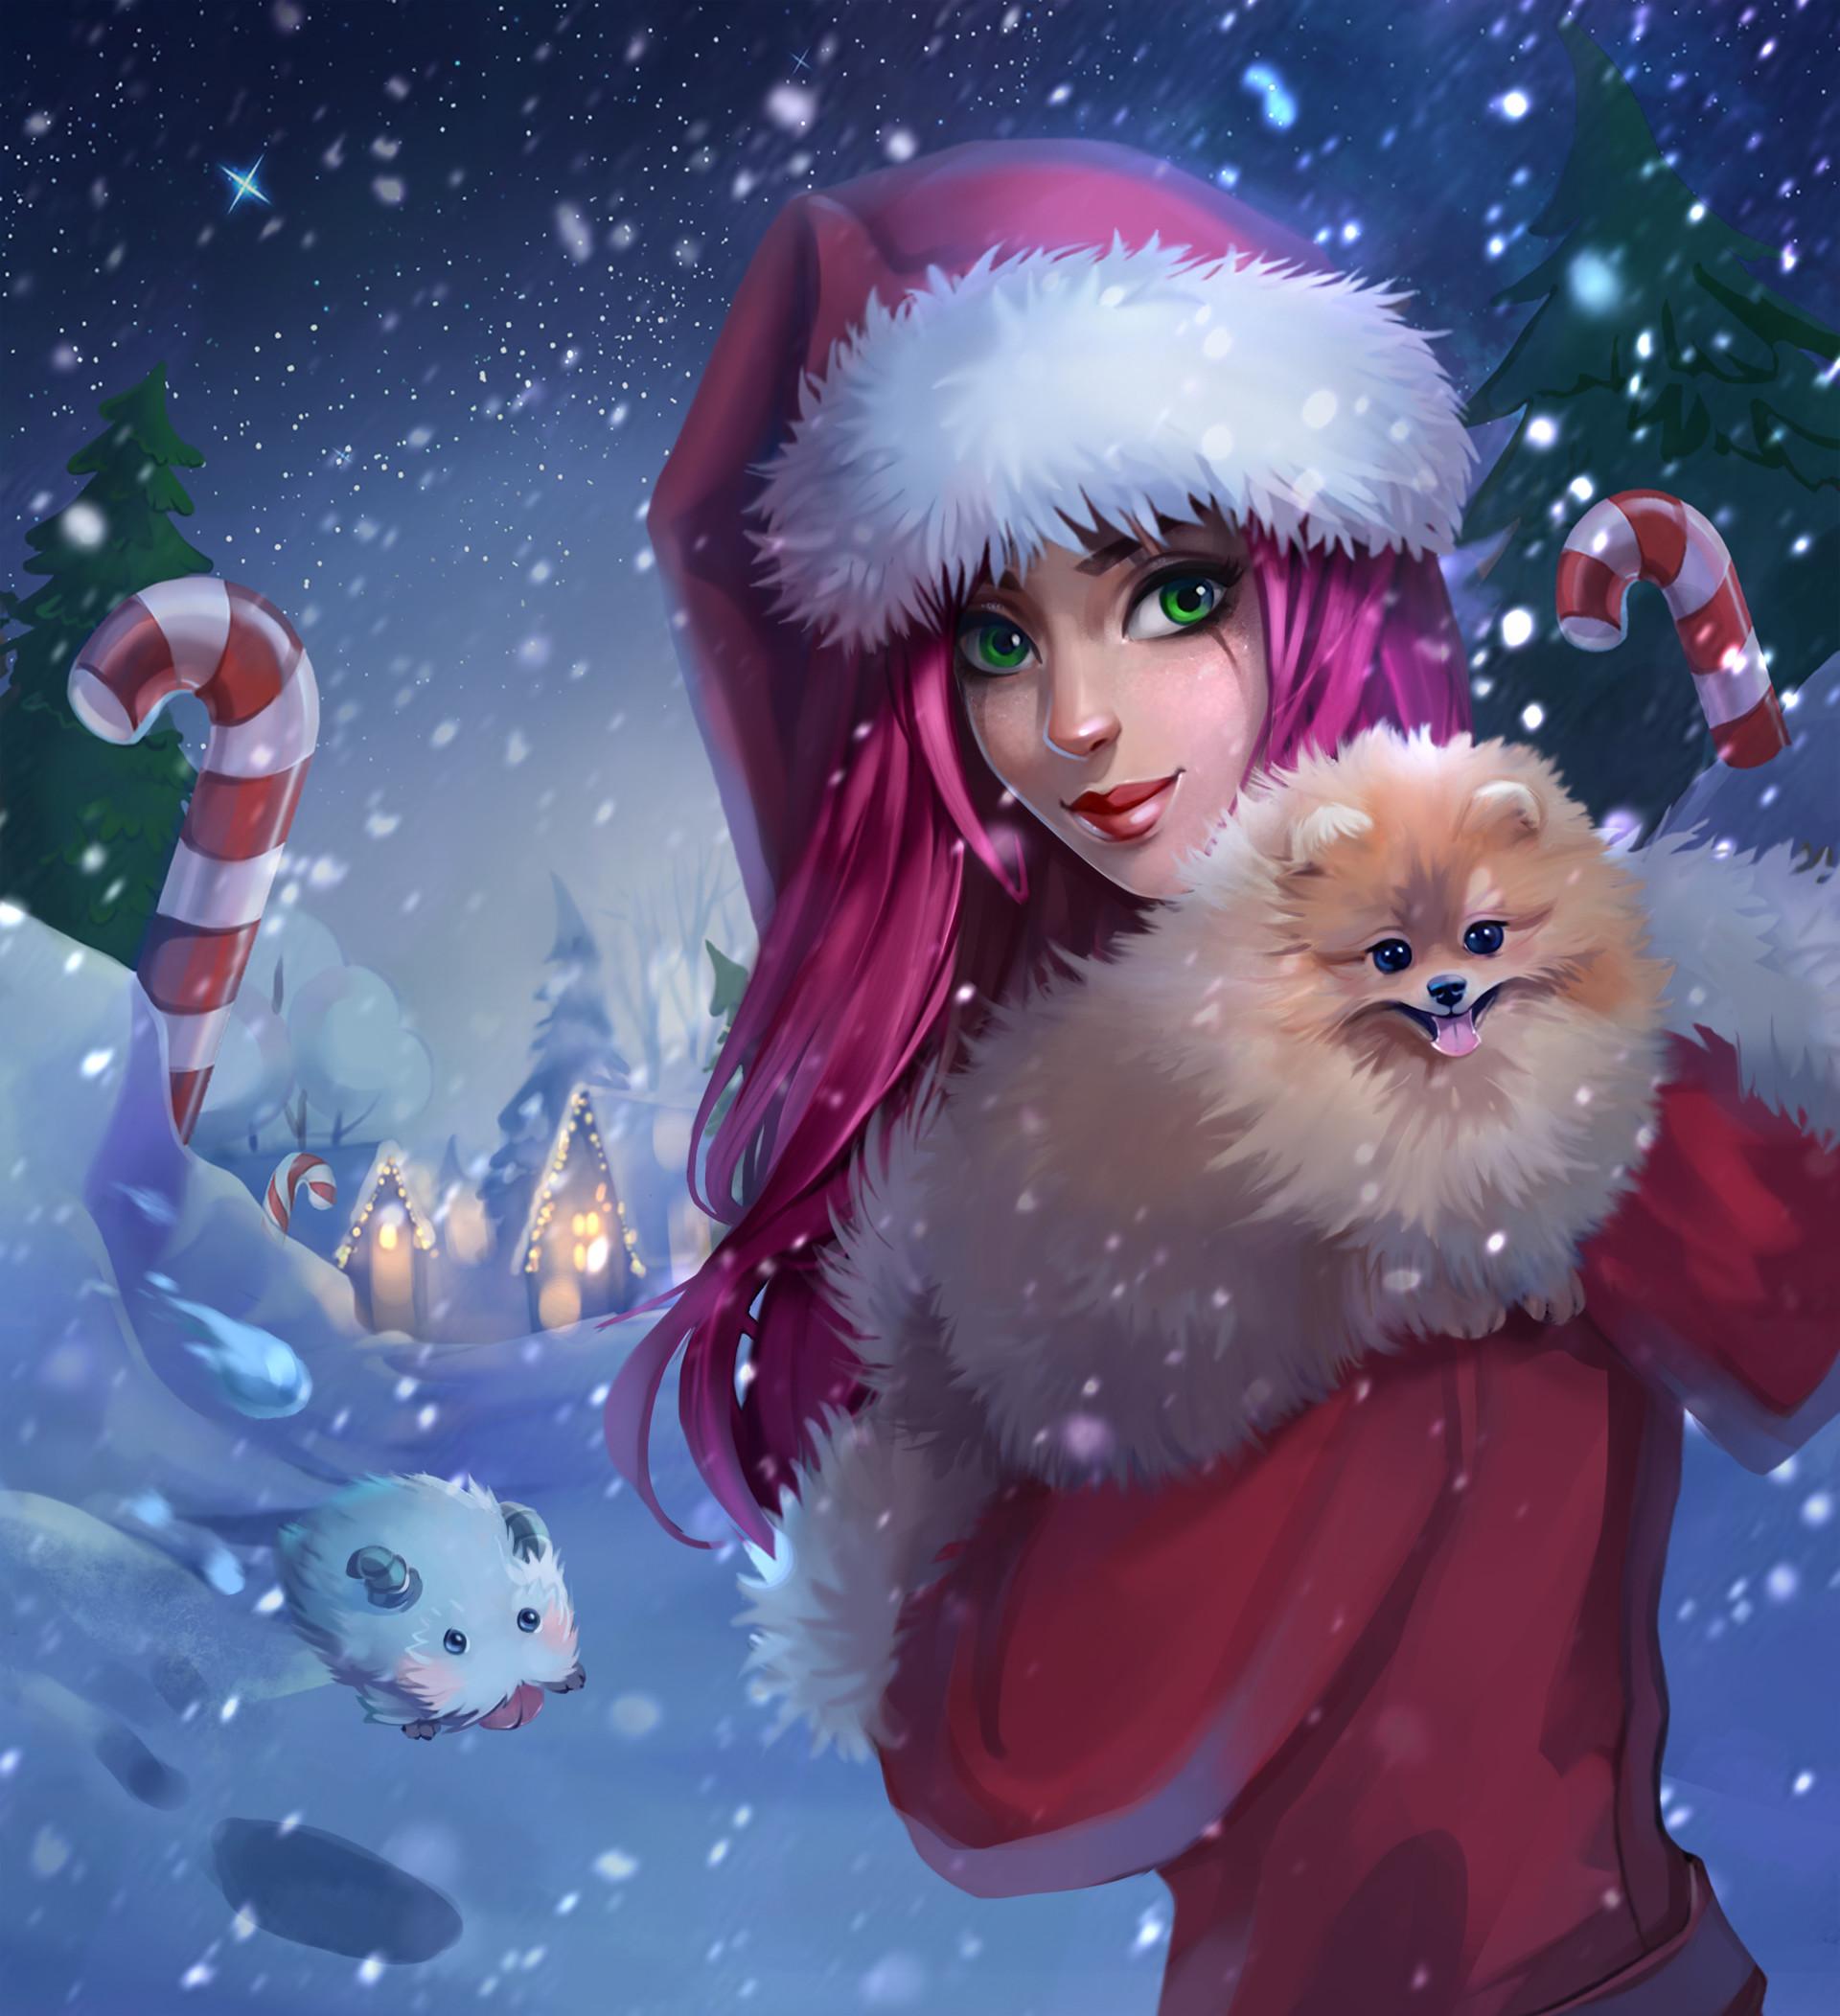 Картинка на аватарку новогодняя девушка